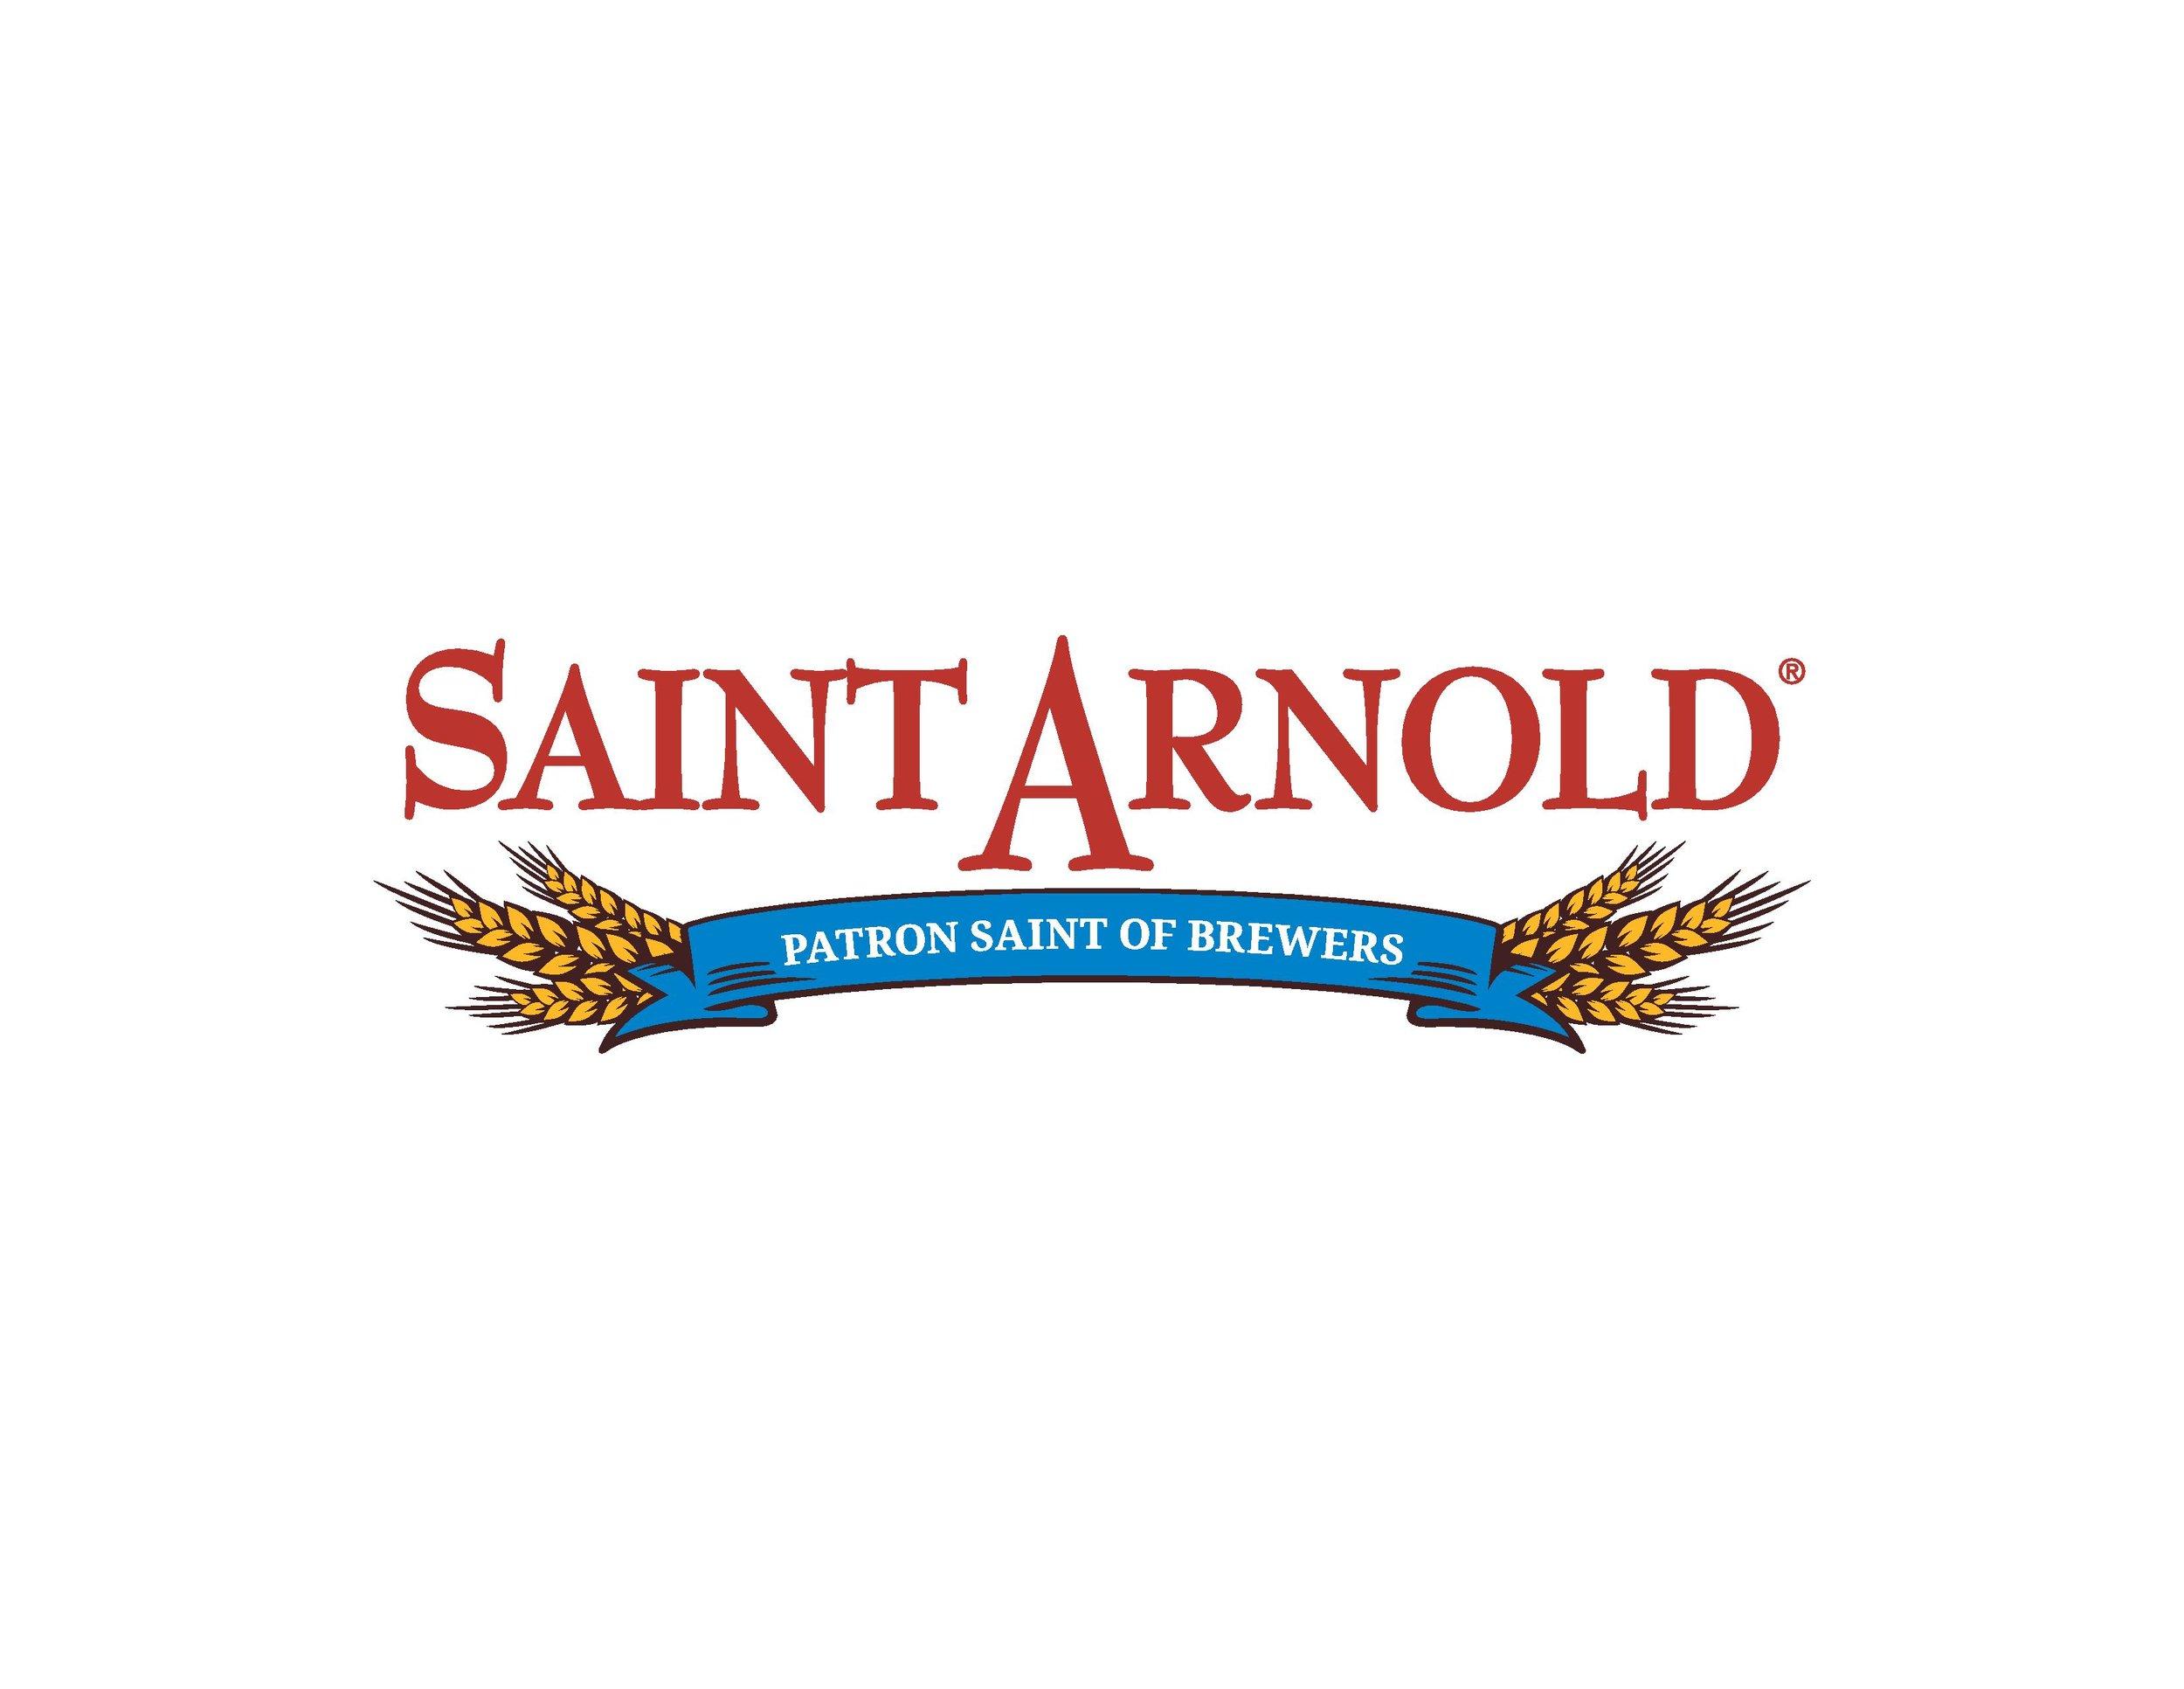 saint_arnold_banner_logo-page-001.jpg